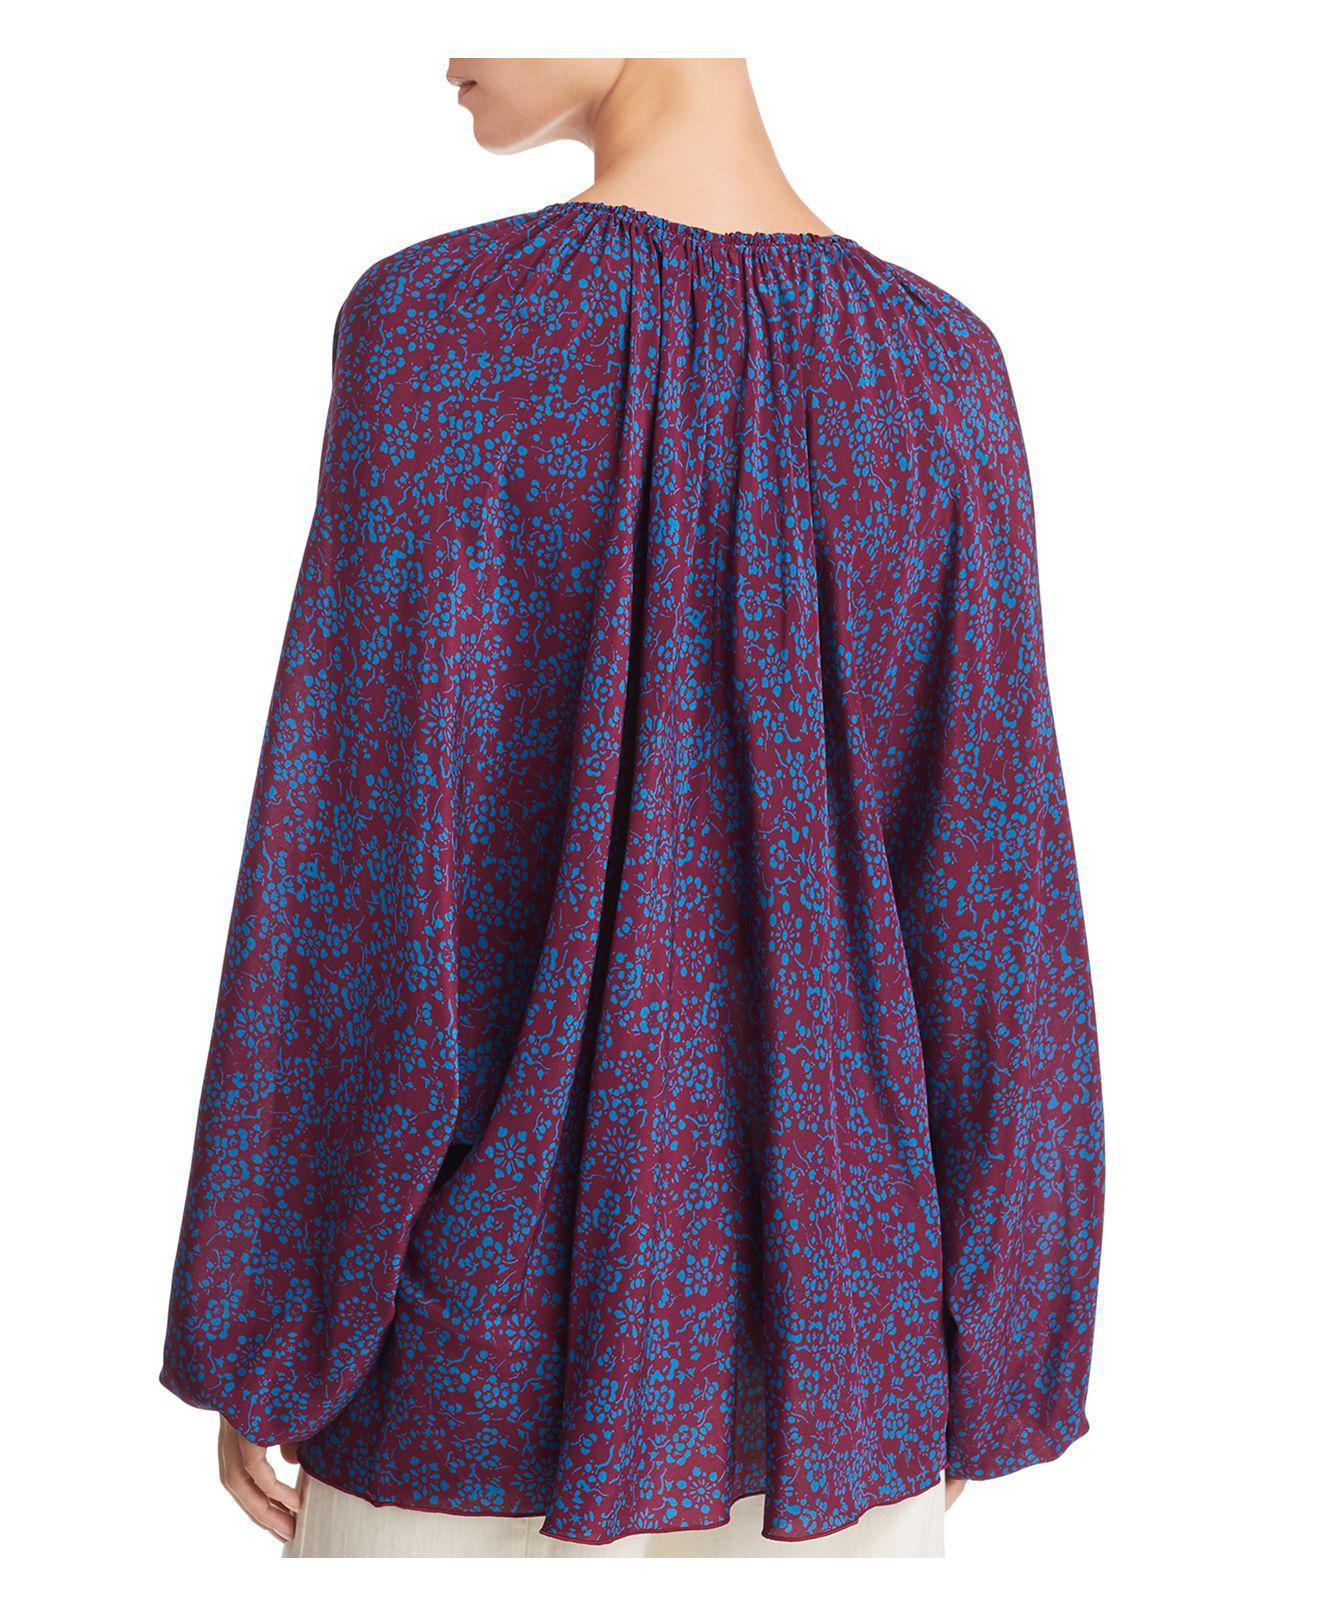 Discount Geniue Stockist Chance Printed Silk Blouse - Purple Elizabeth & James Amazon Online Free Shipping Sast Cheap Sale Explore Hot Sale Sale Online xiD6yw6dL